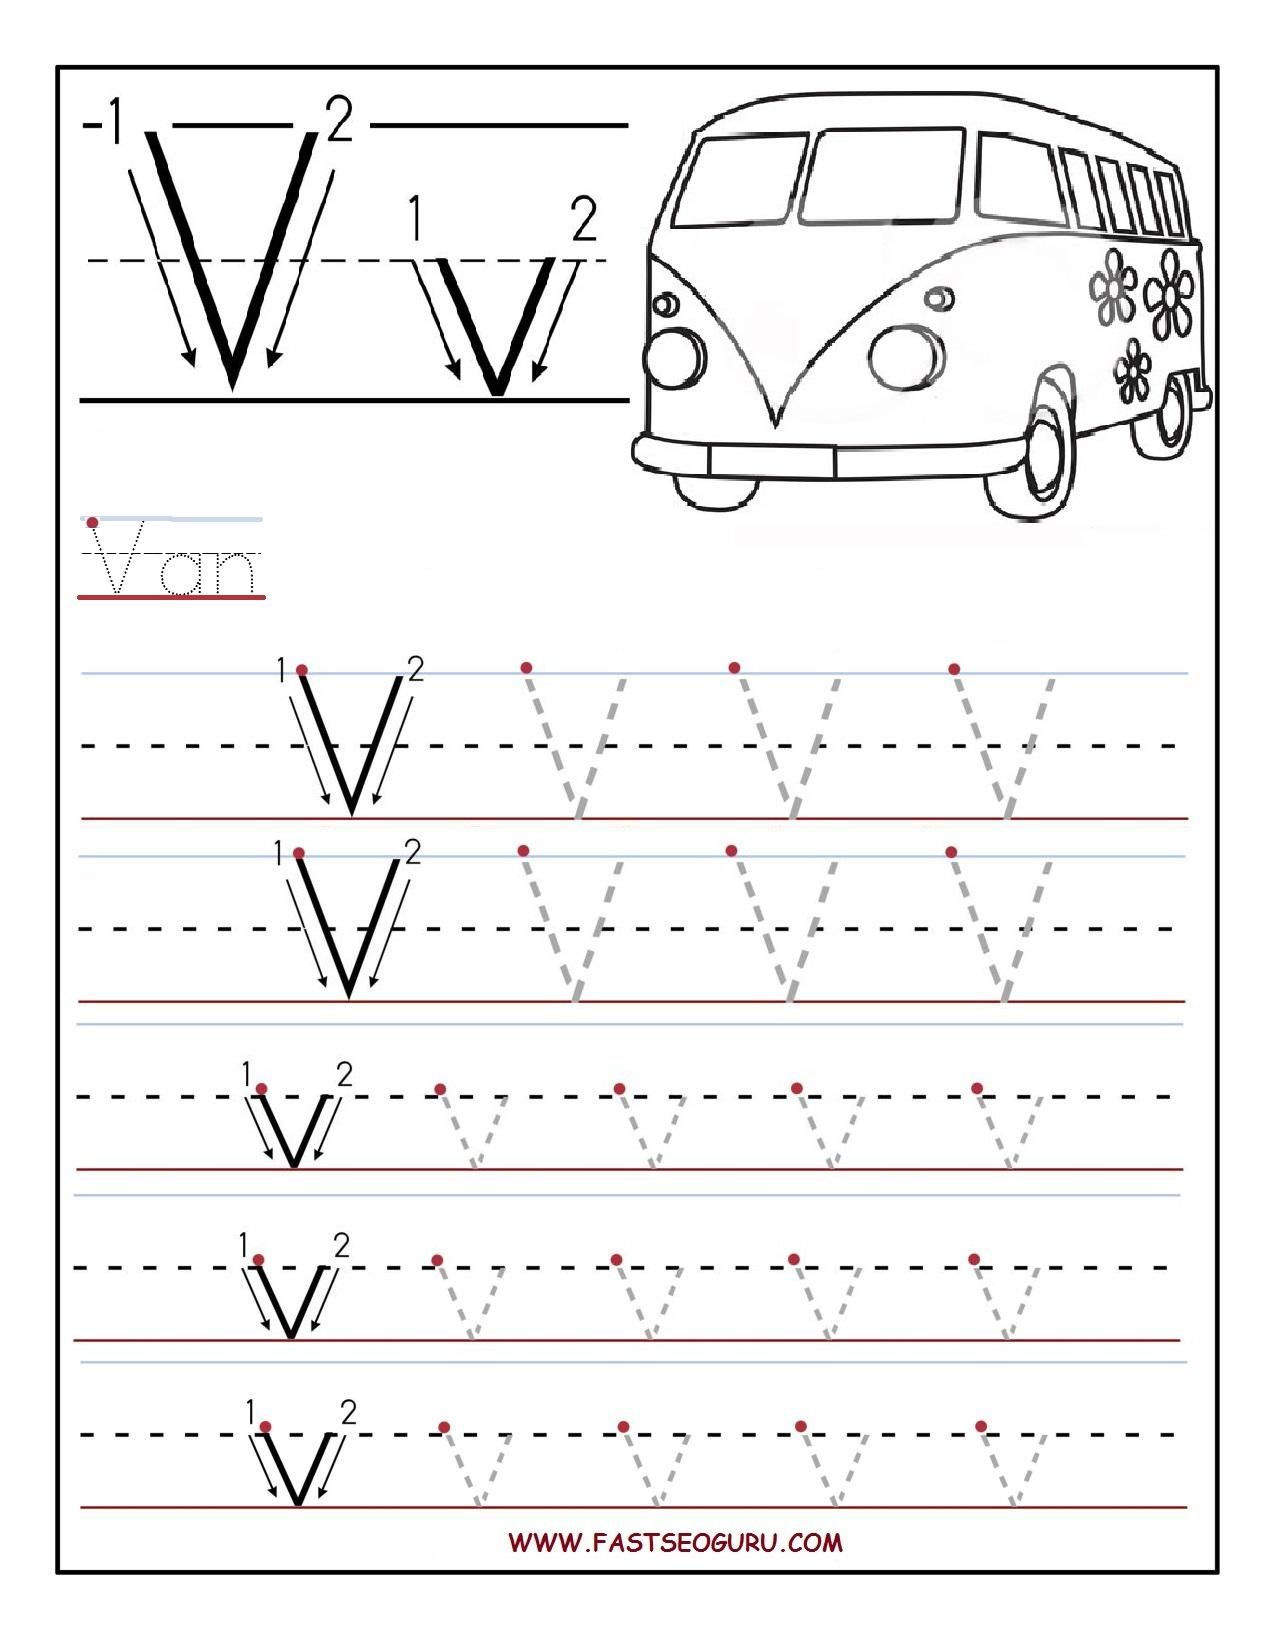 V Worksheet For Preschoolers